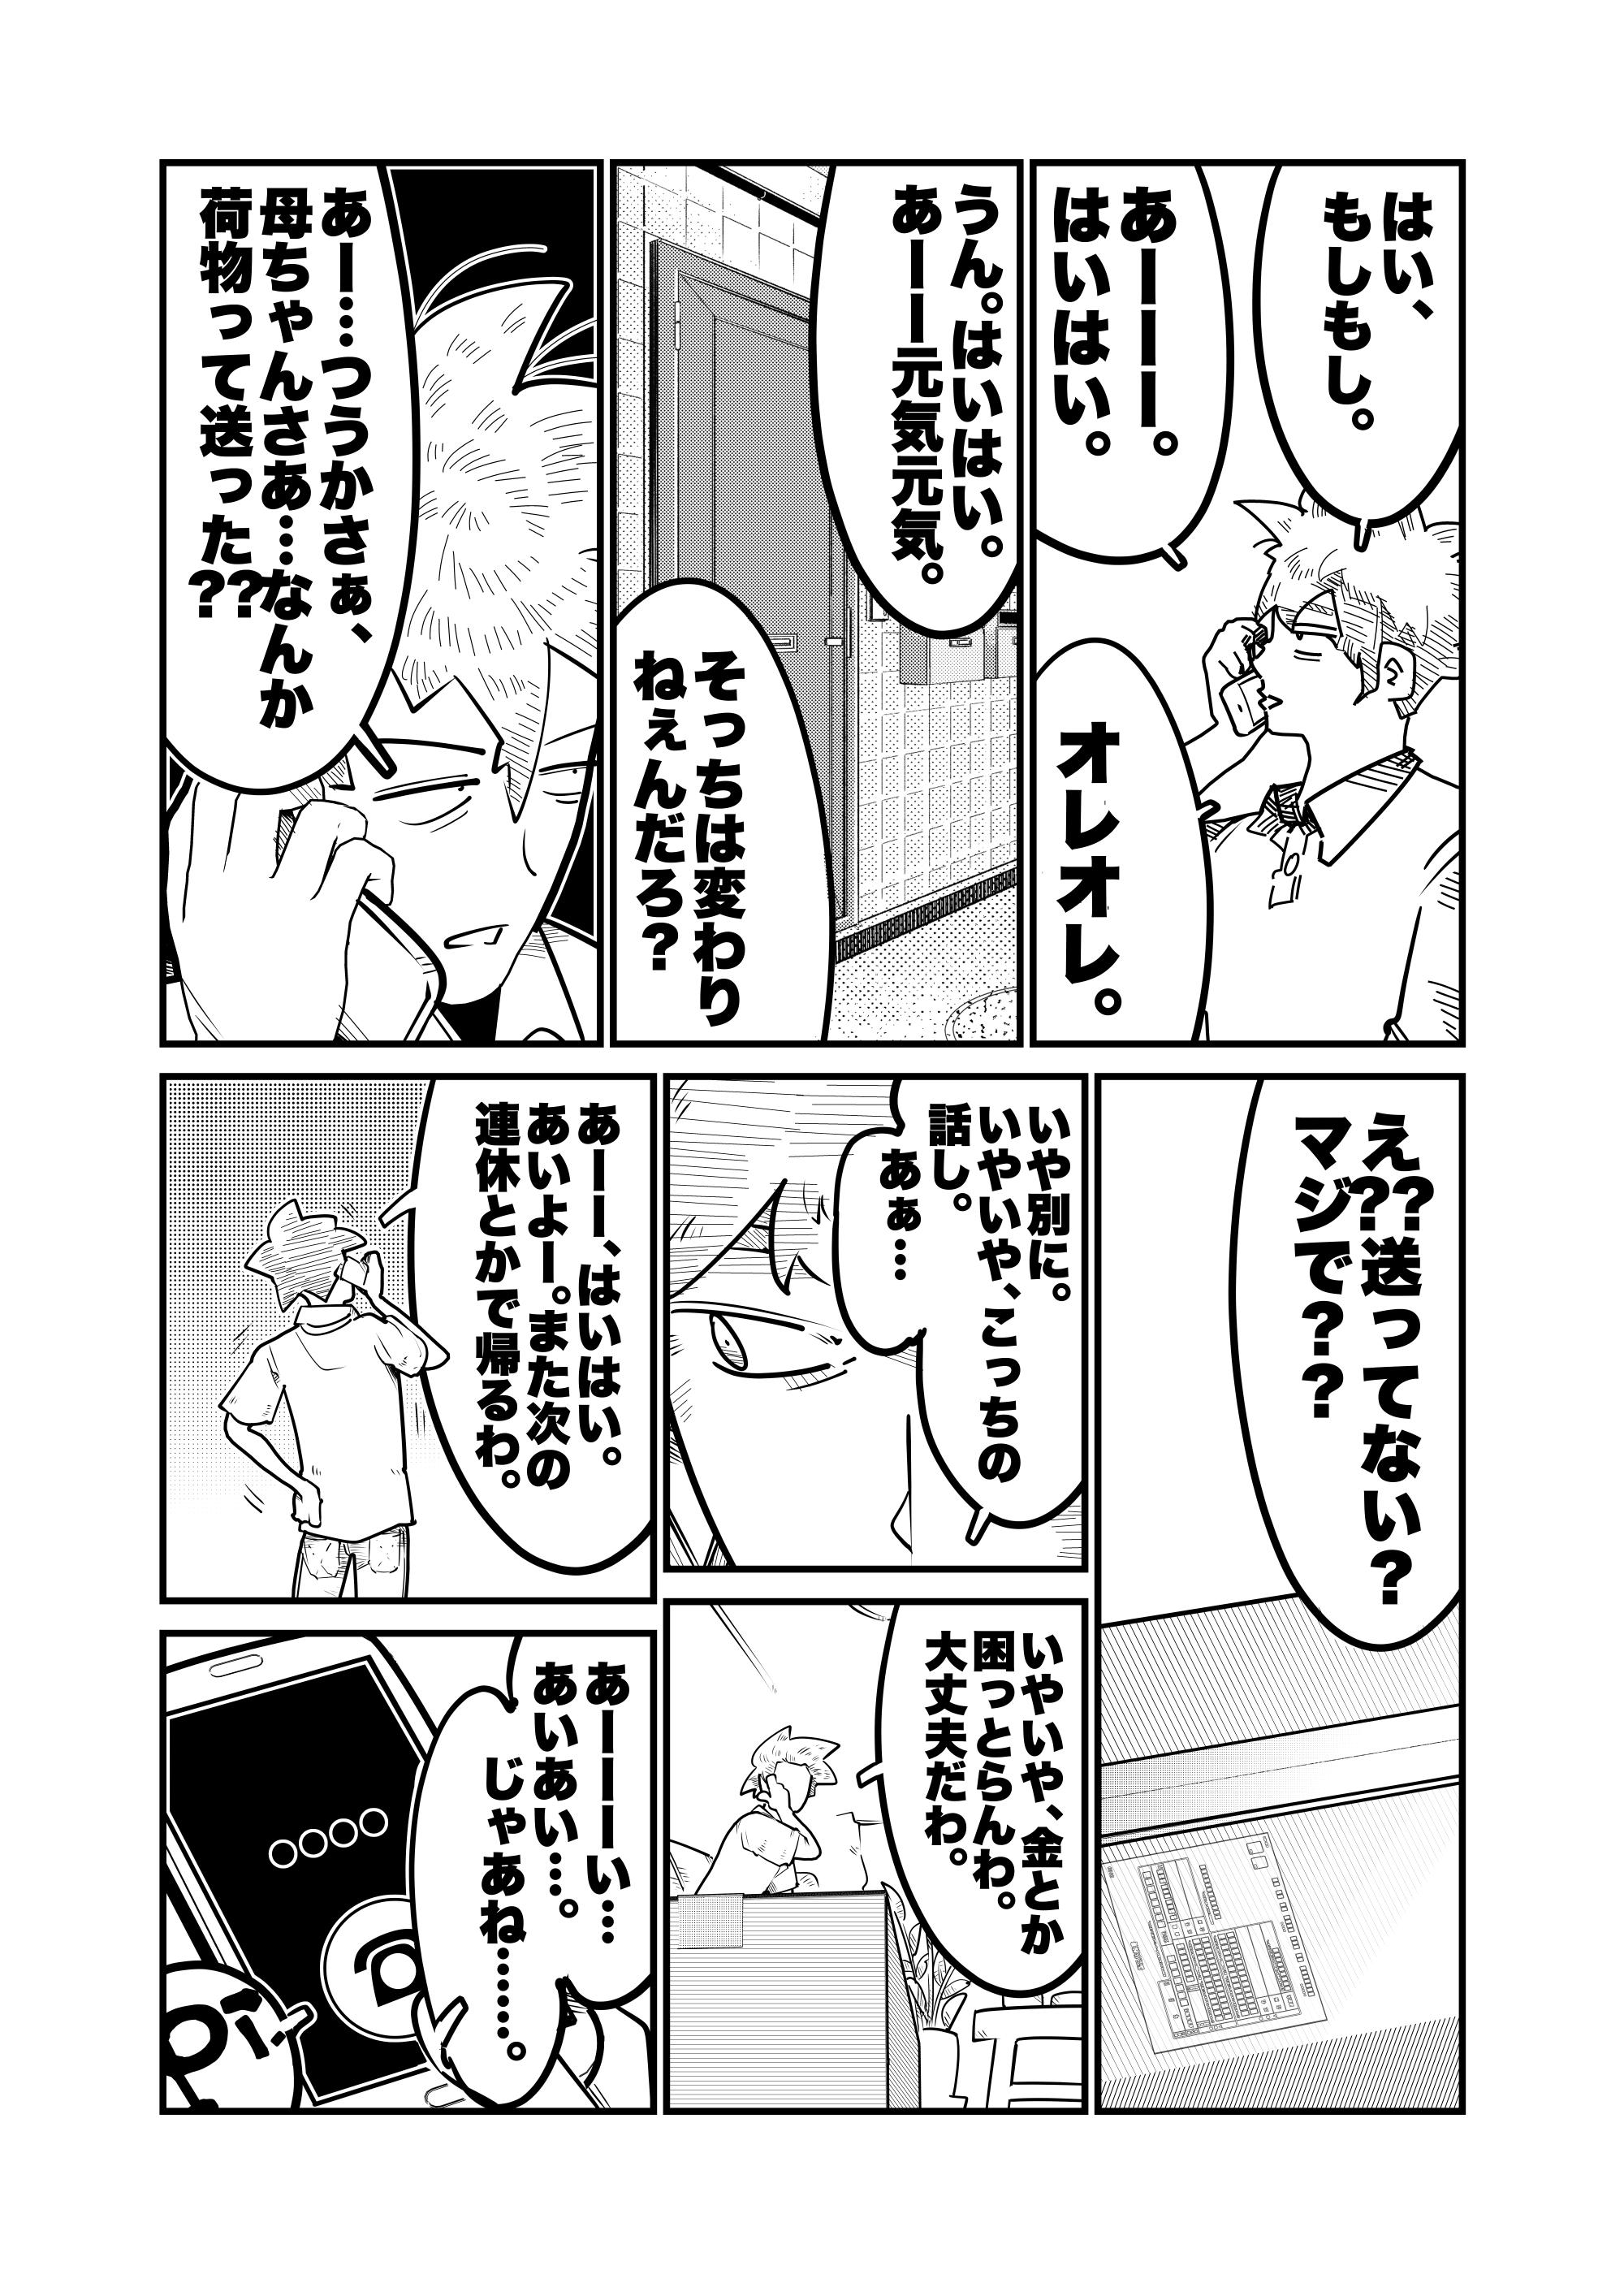 f:id:terashimaru117:20210915014142p:plain